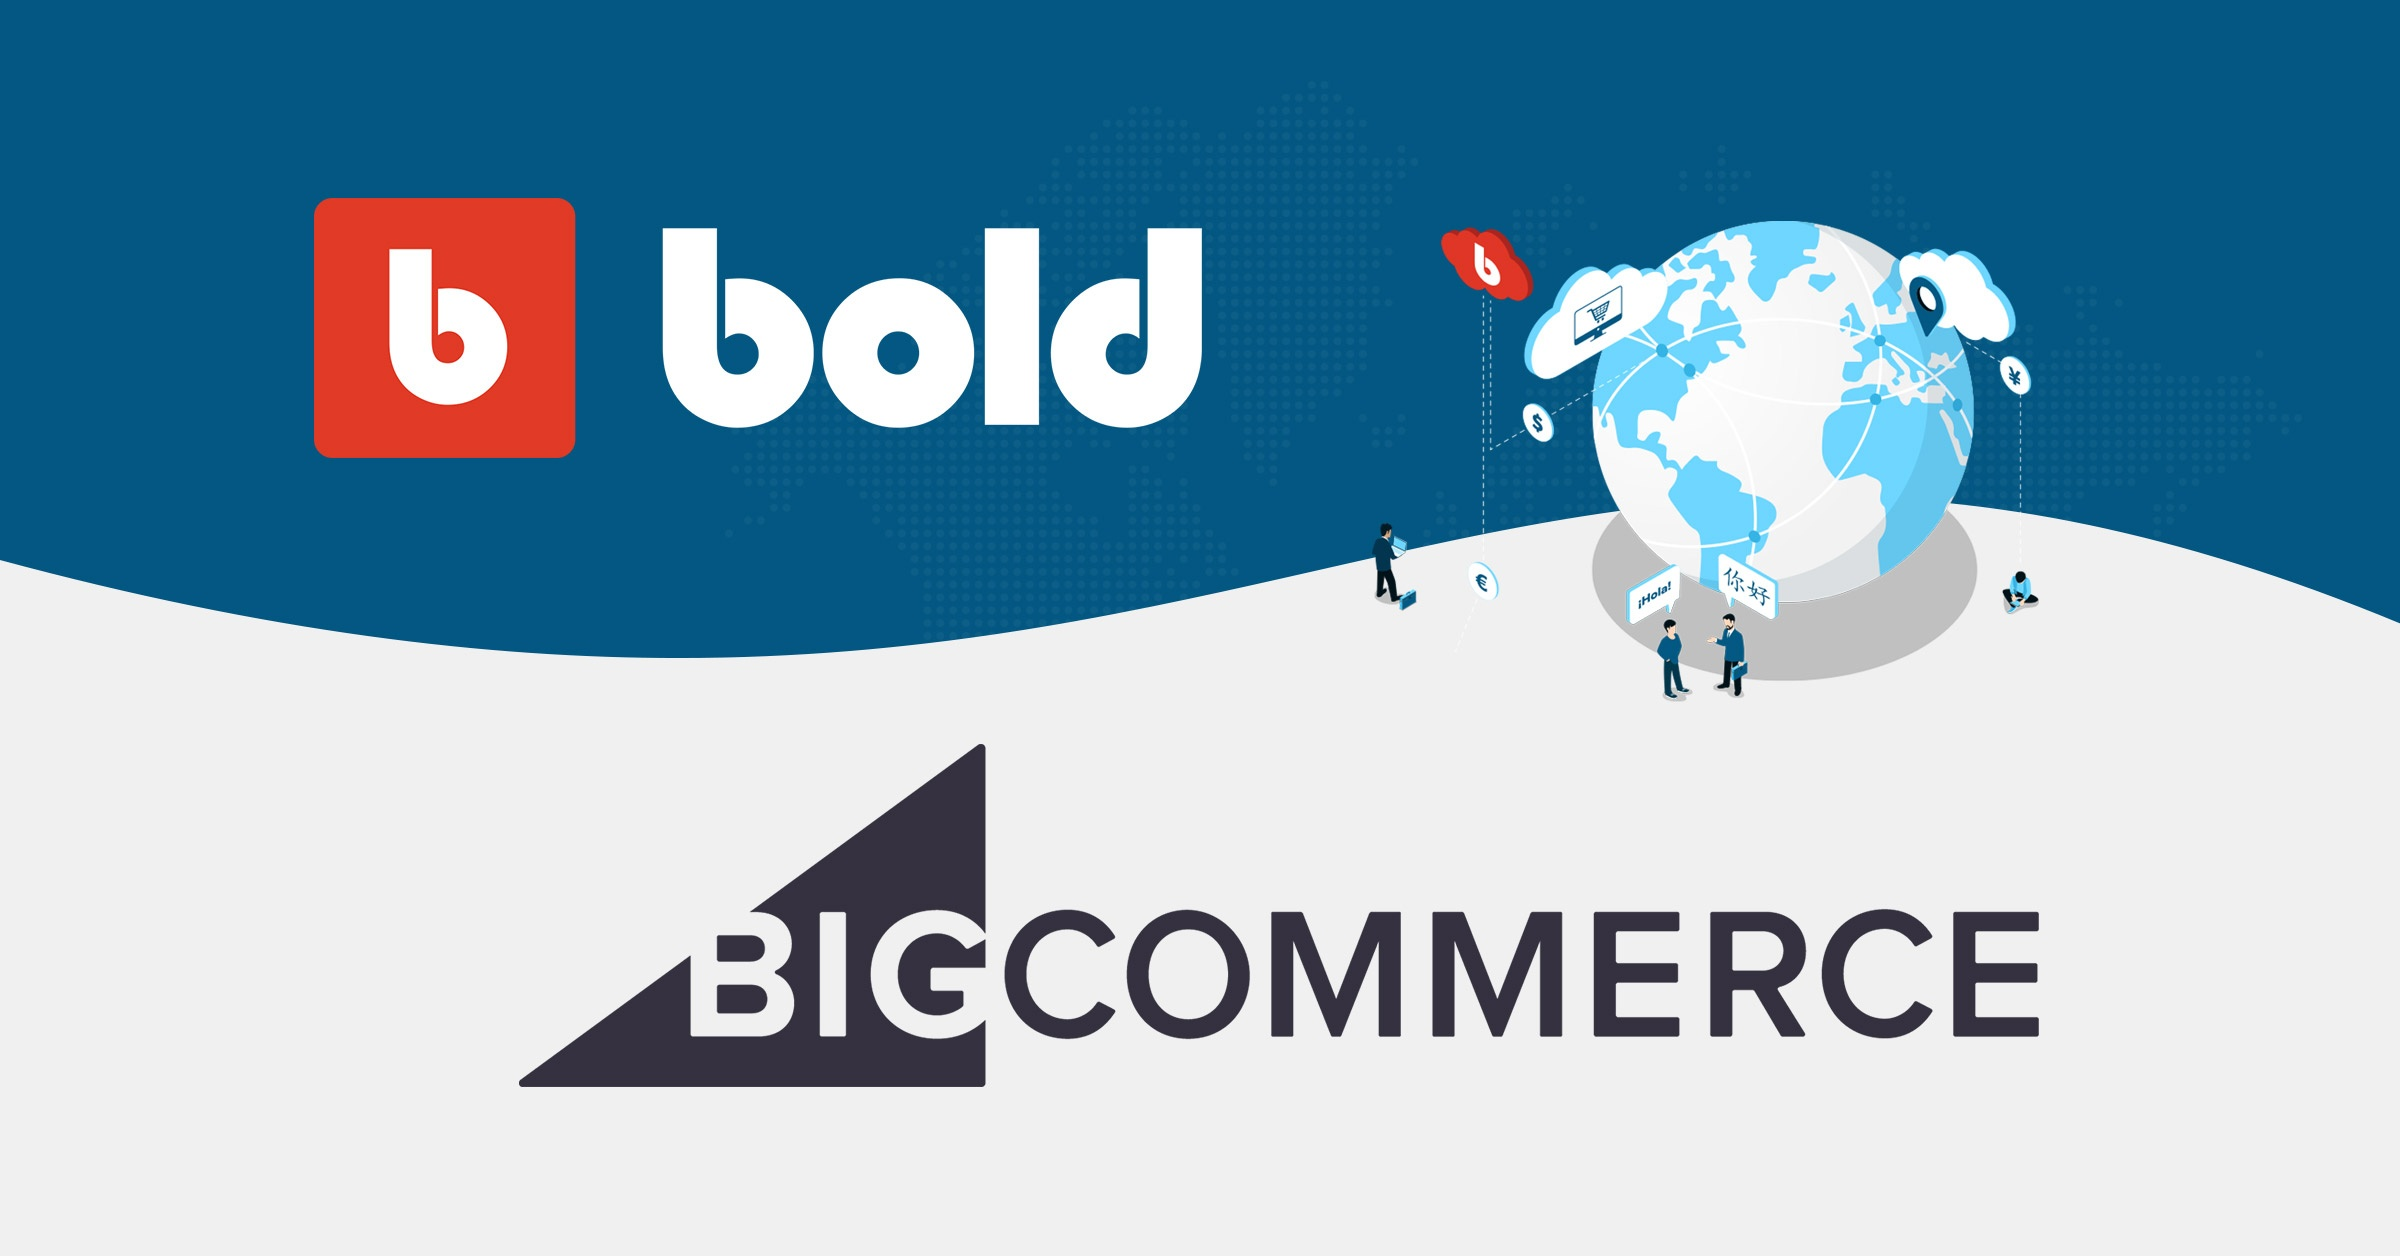 blog-bold-bigcommerce (1)